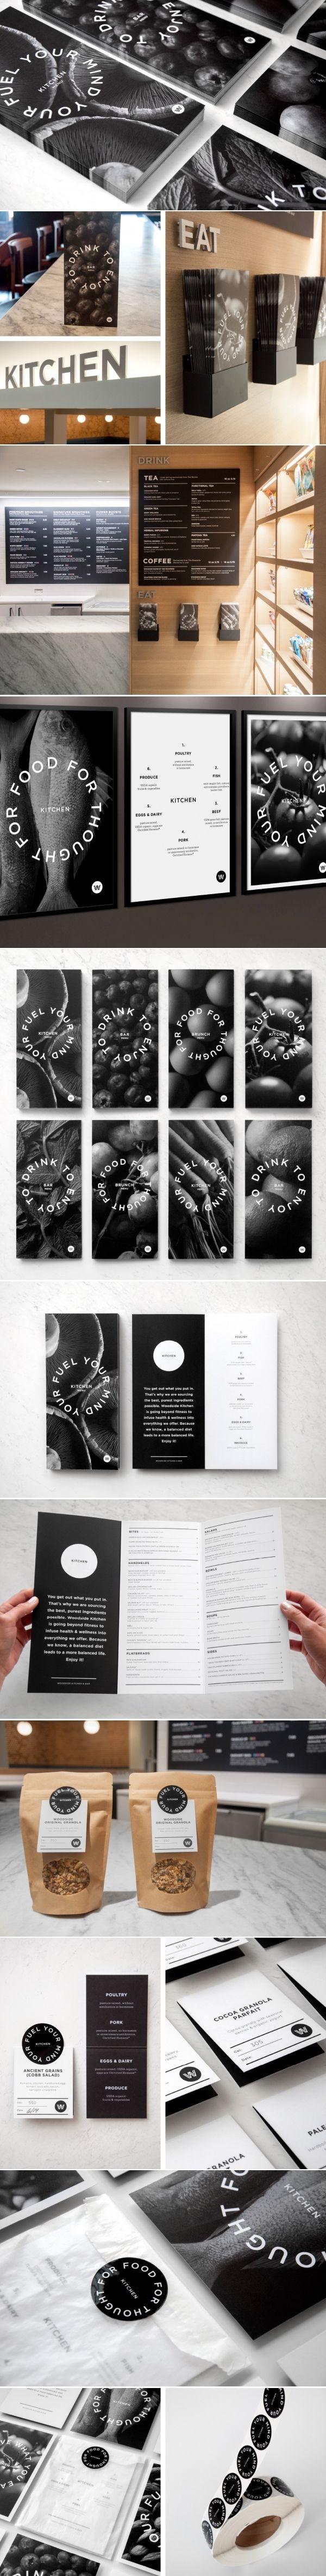 White apron menu warrington - Woodside Kitchen Bar Branding Business Collateral Copywriting Design Marketing Materials